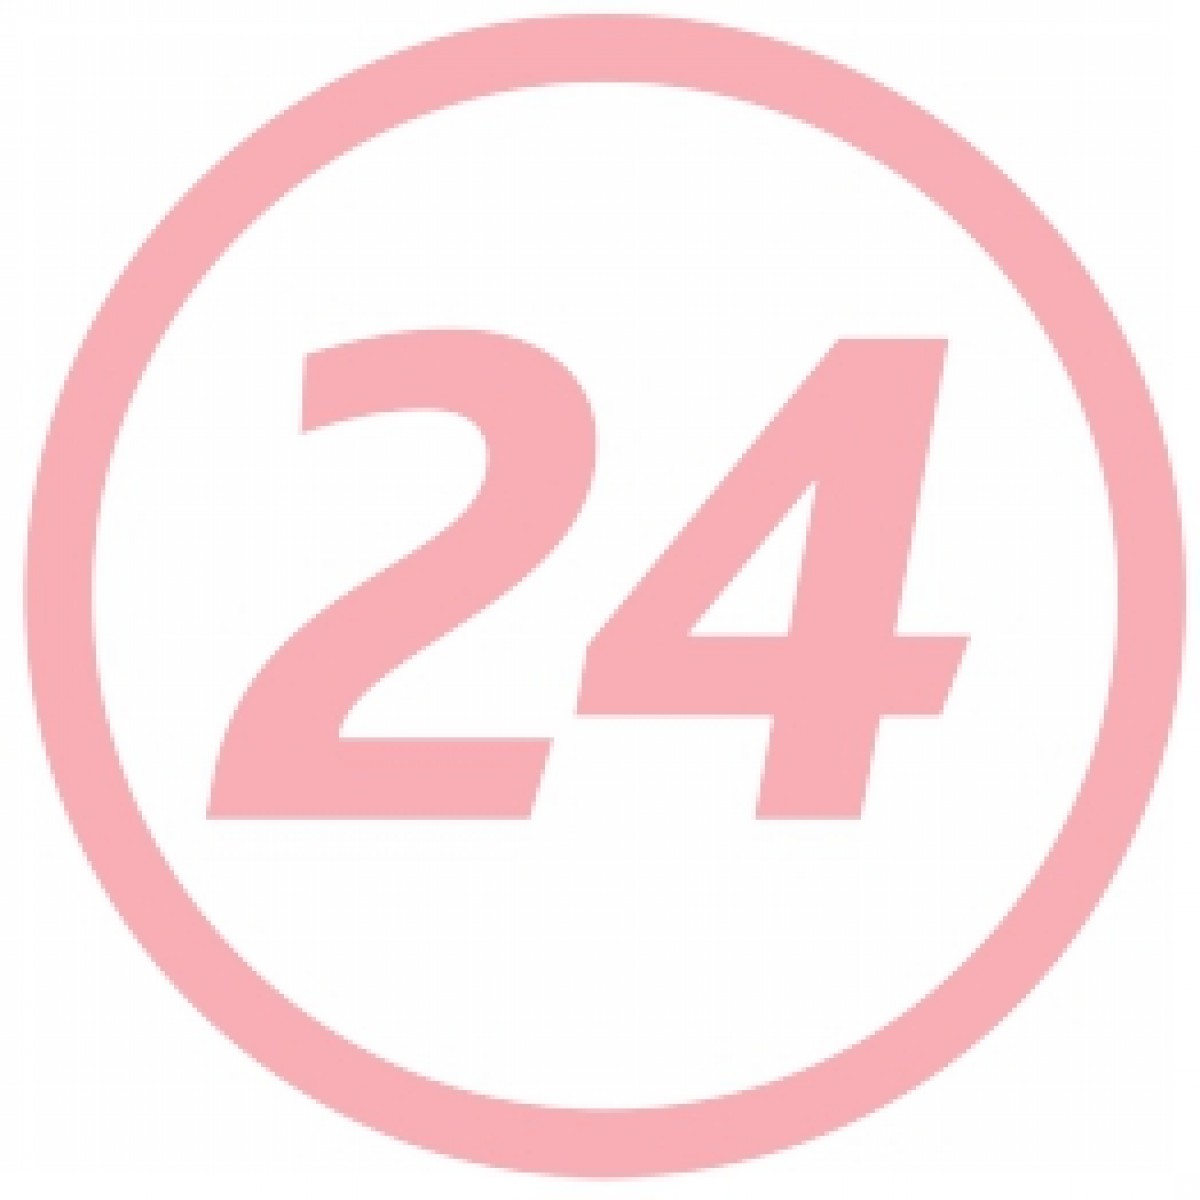 Hartmann Molicare Pad 2 Picaturi Tampoane pentru Incontinenta Usoara, Tampoane, 28buc